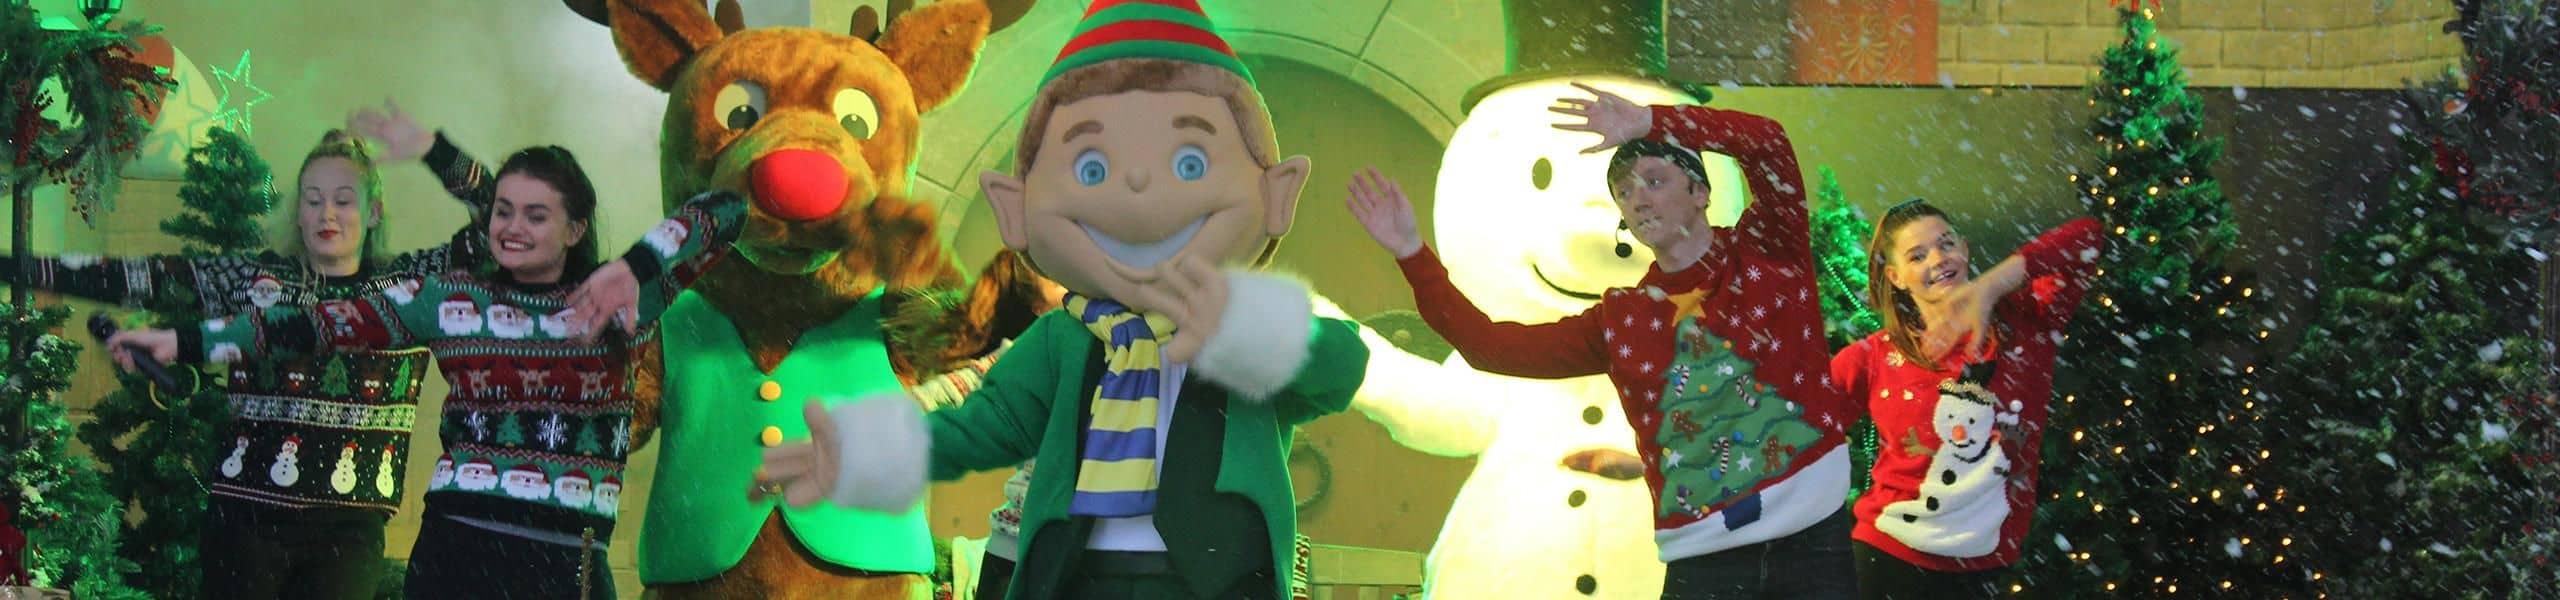 A Very Merry Christmas Show